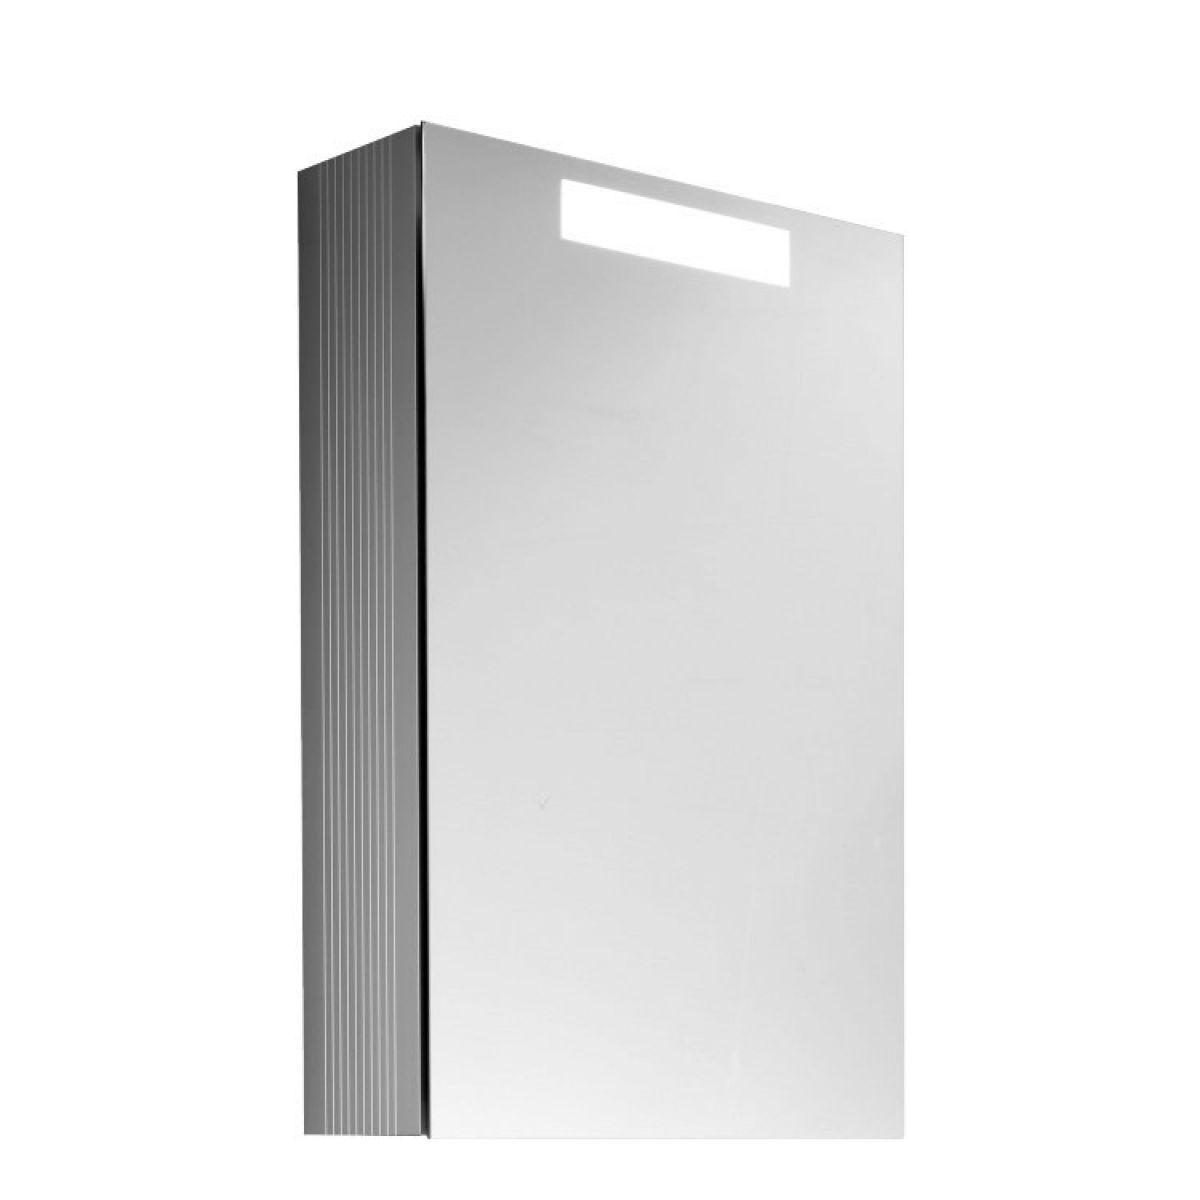 villeroy boch soho subway mirror cabinet uk bathrooms. Black Bedroom Furniture Sets. Home Design Ideas